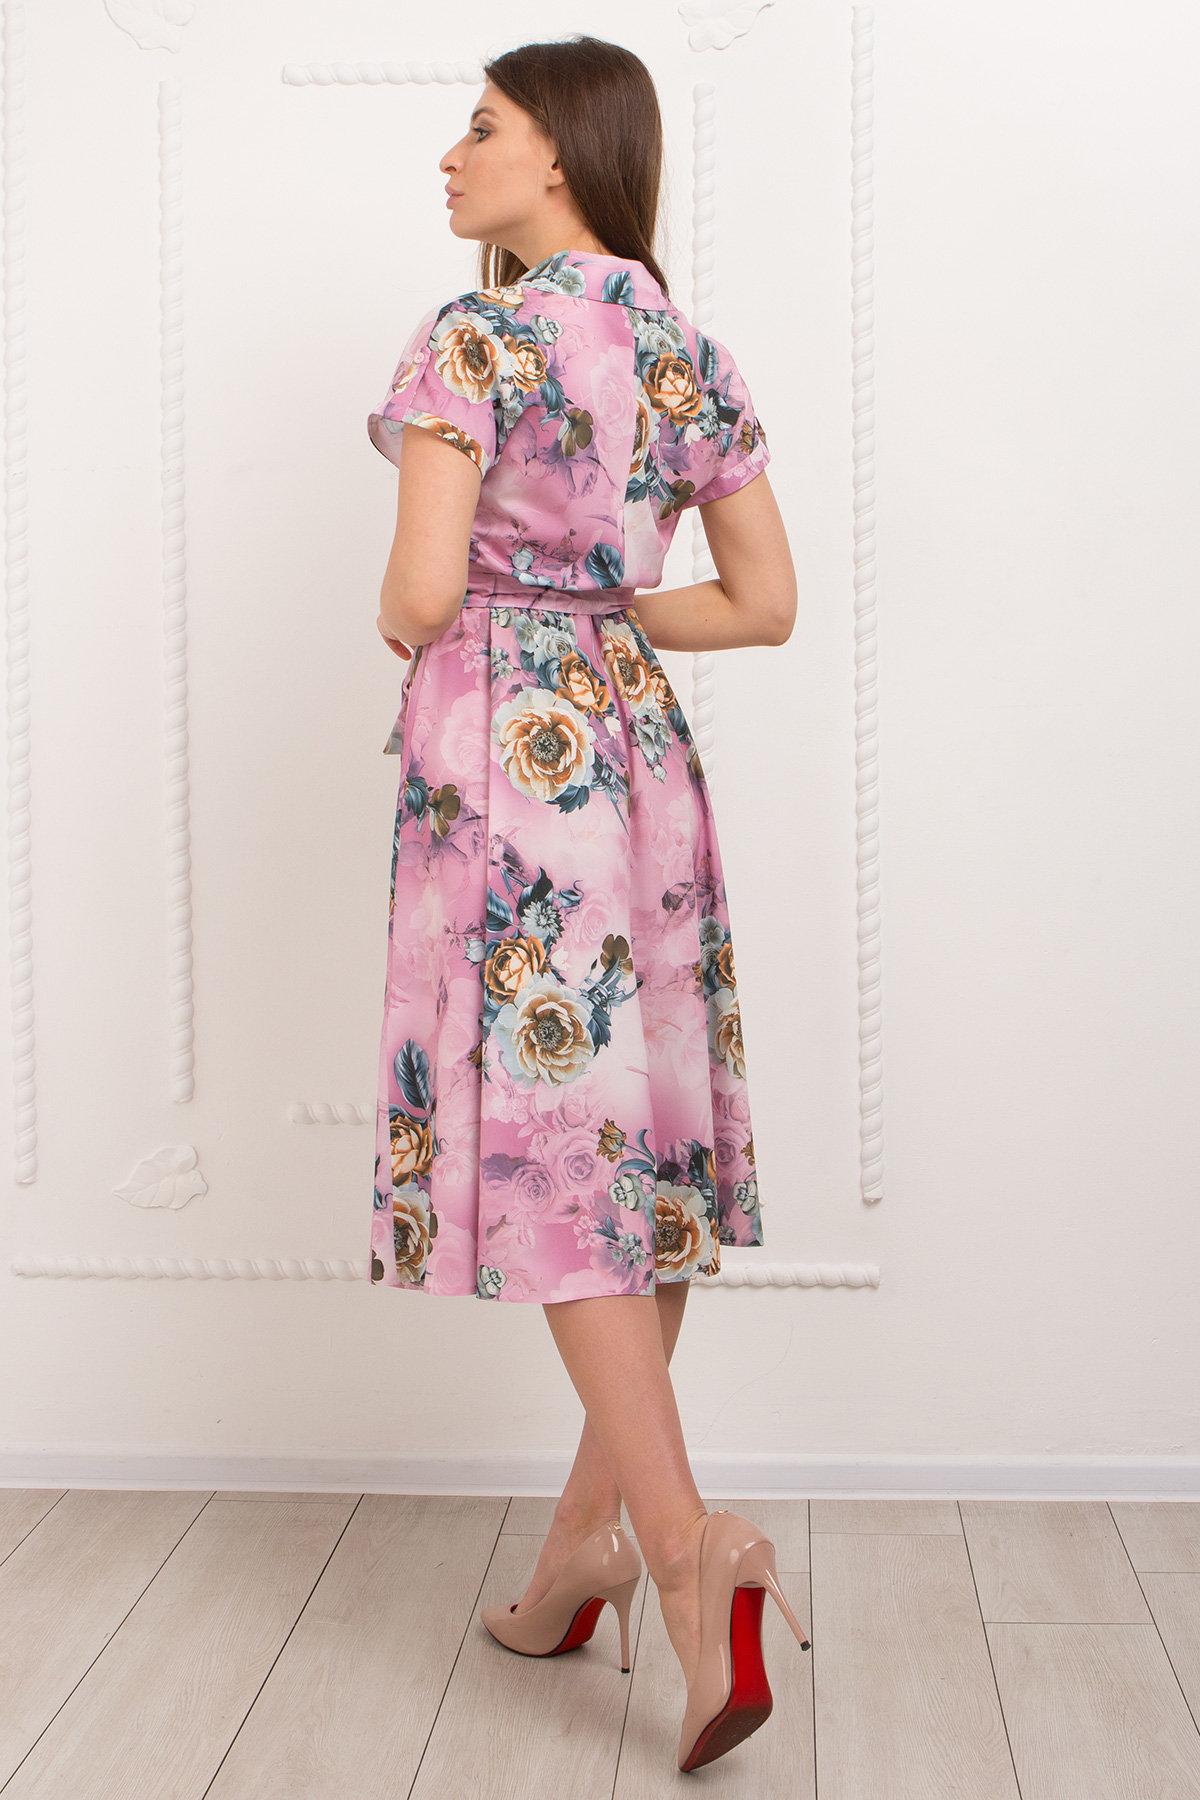 Платье Санжар 9090 АРТ. 45412 Цвет: цветы комби роз/мол/охра - фото 4, интернет магазин tm-modus.ru